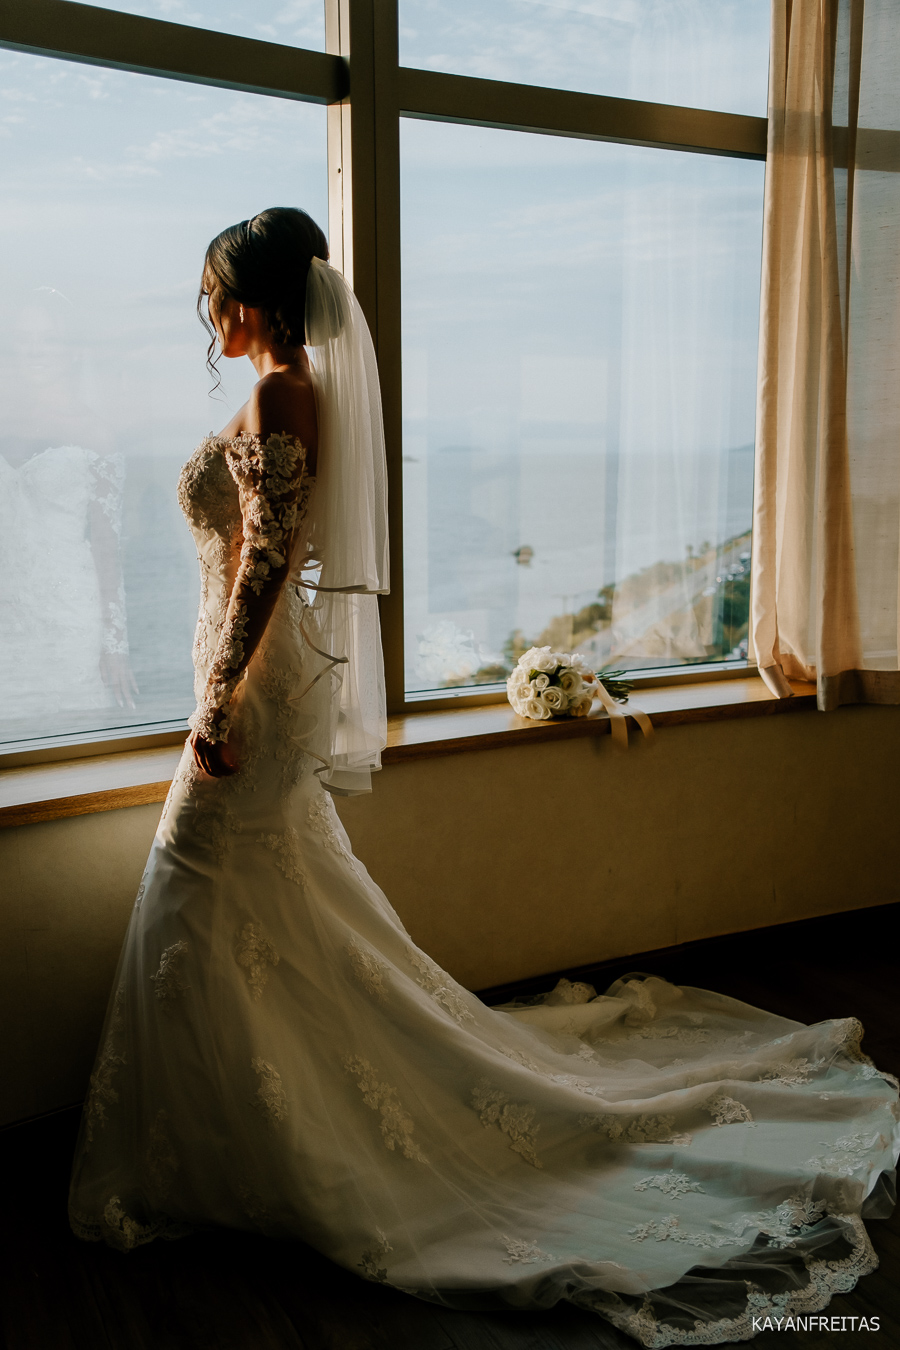 casamento-indaia-floripa-0032 Casamento Indaiá Florianópolis - Deise e Dário